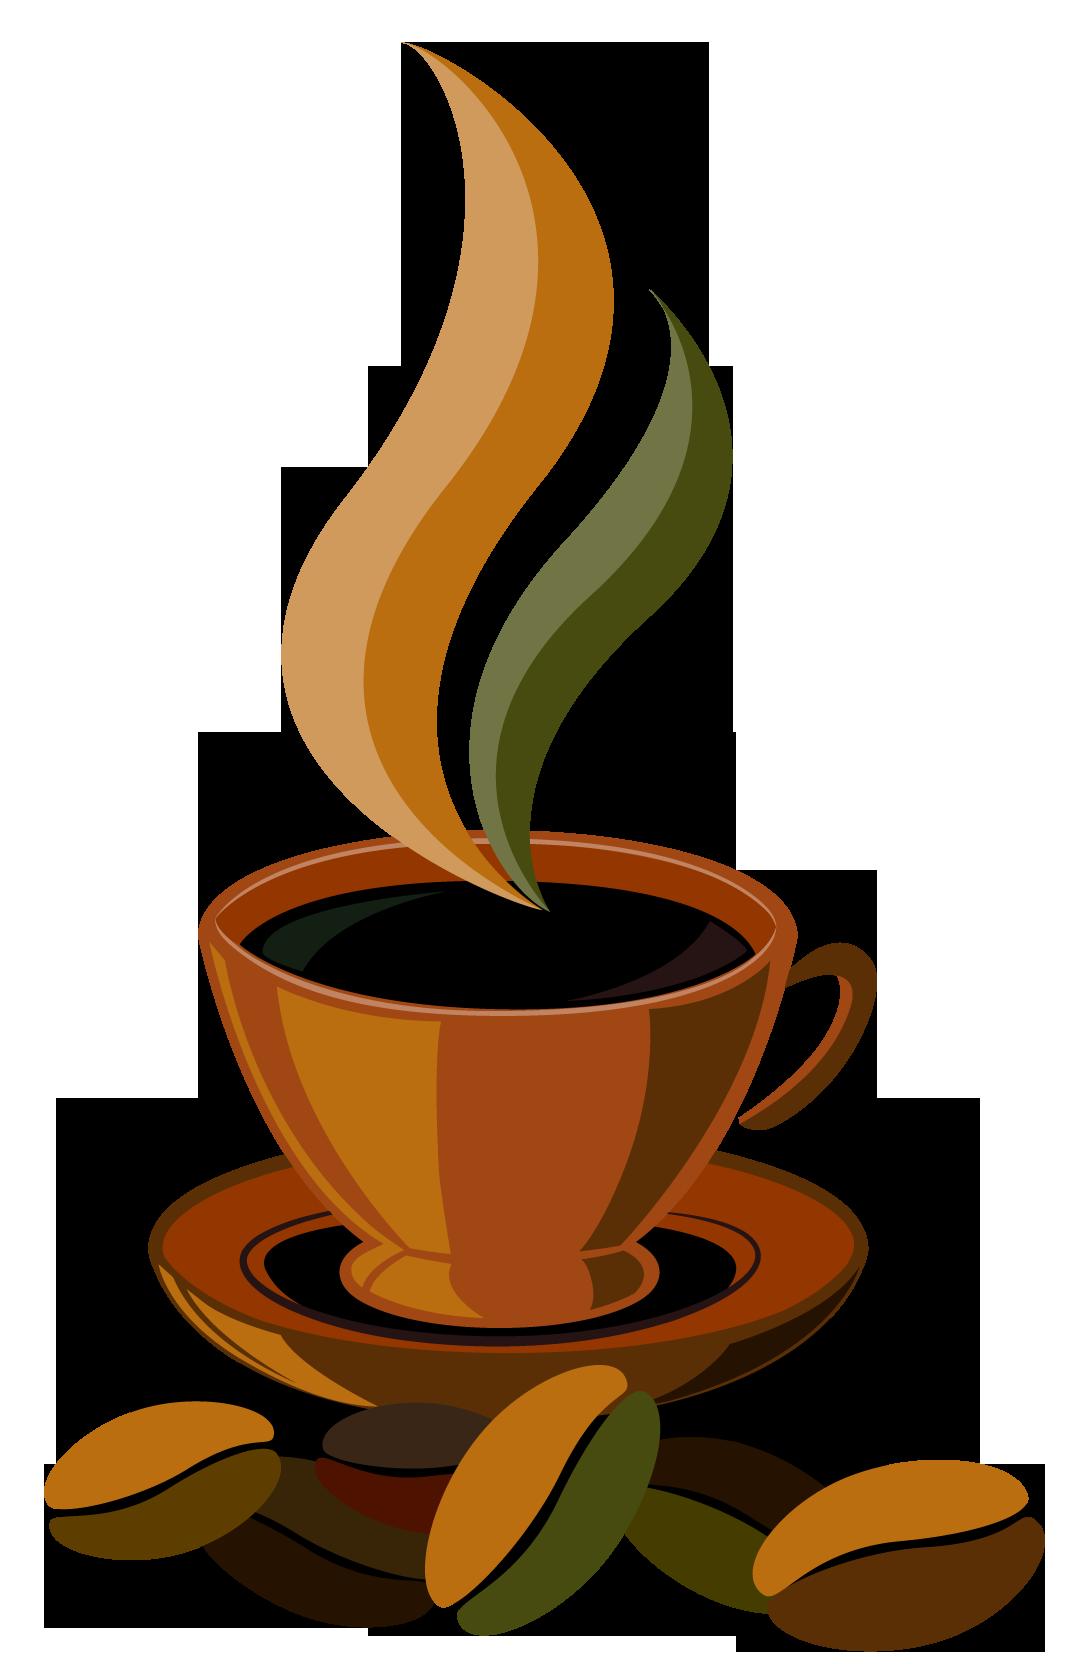 Coffee cup cartoon